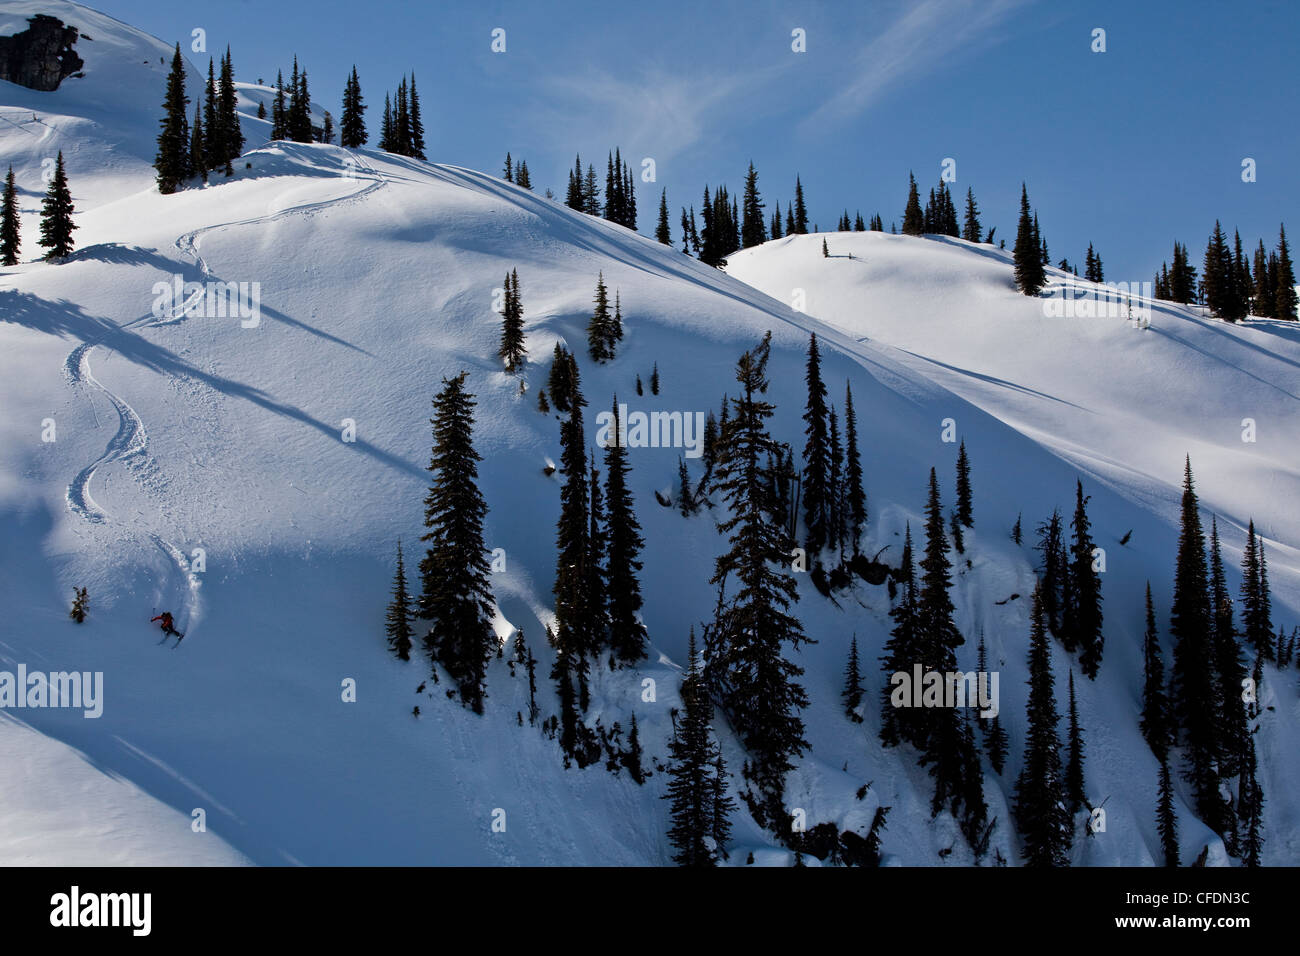 A male skier earns his turns and skis fresh powder while ski touring at, Sol Mountain Lodge, Monashees, British - Stock Image